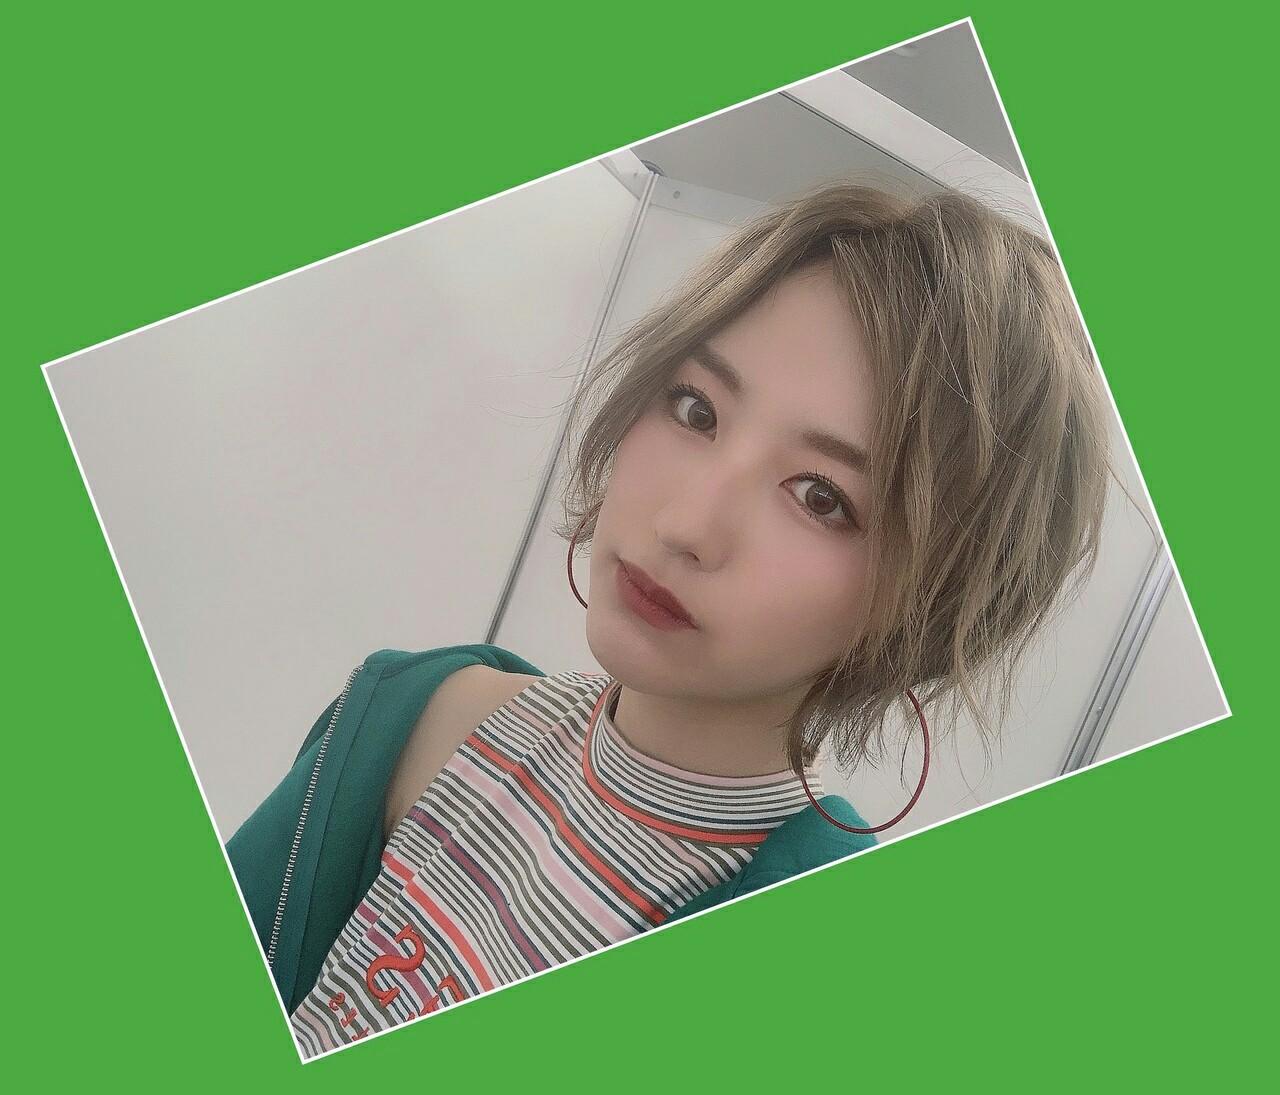 f:id:asitaha46:20190521021359j:image